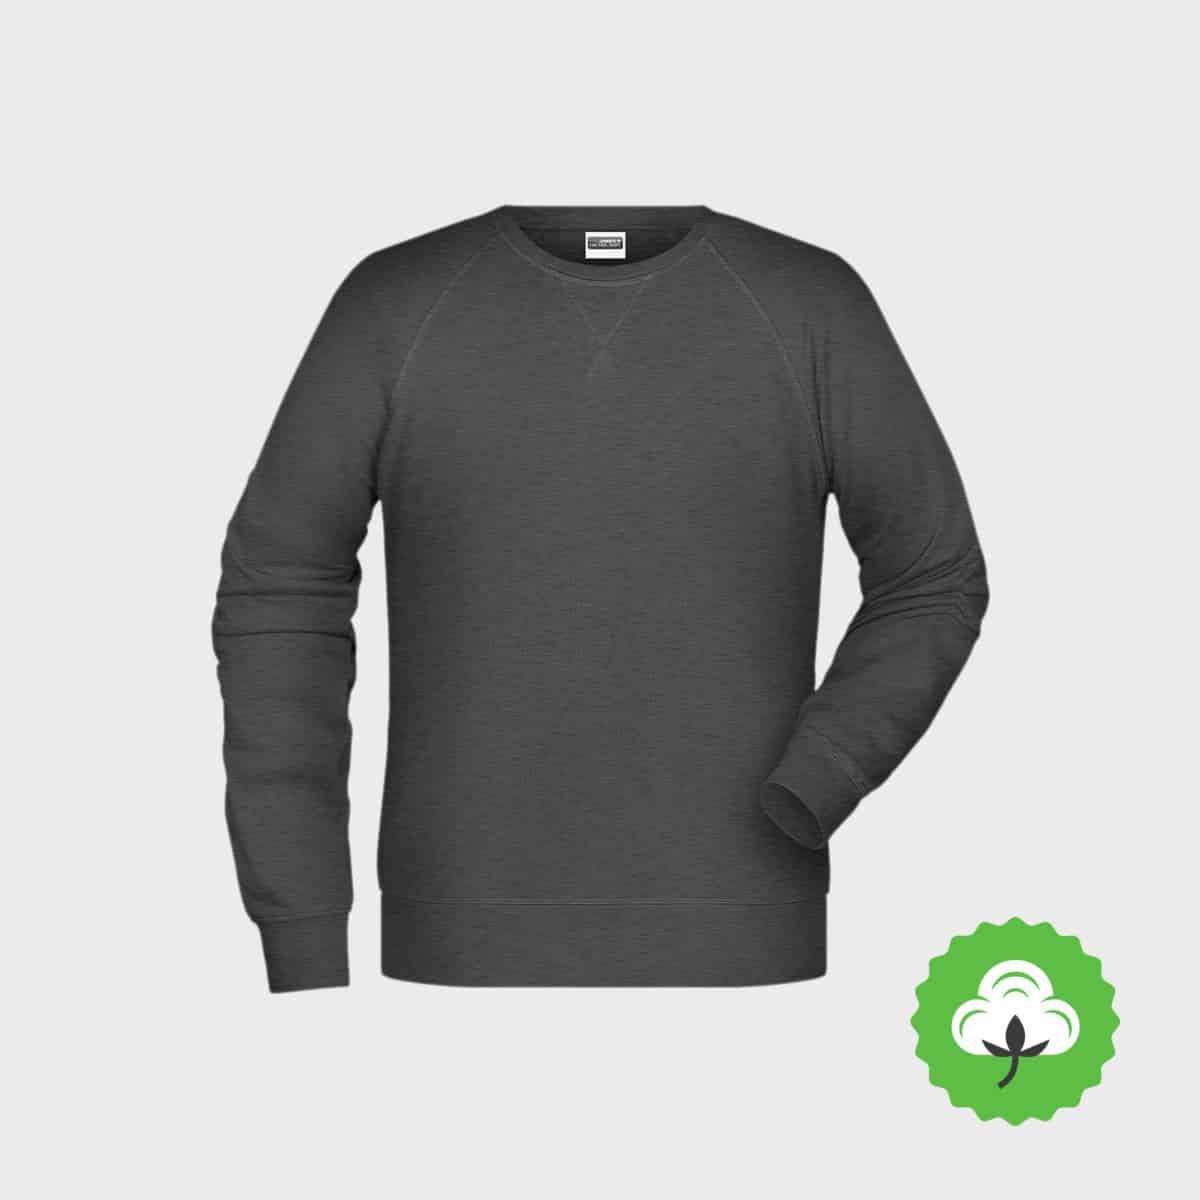 Damen-Bio-Sweatshirt-kaufen